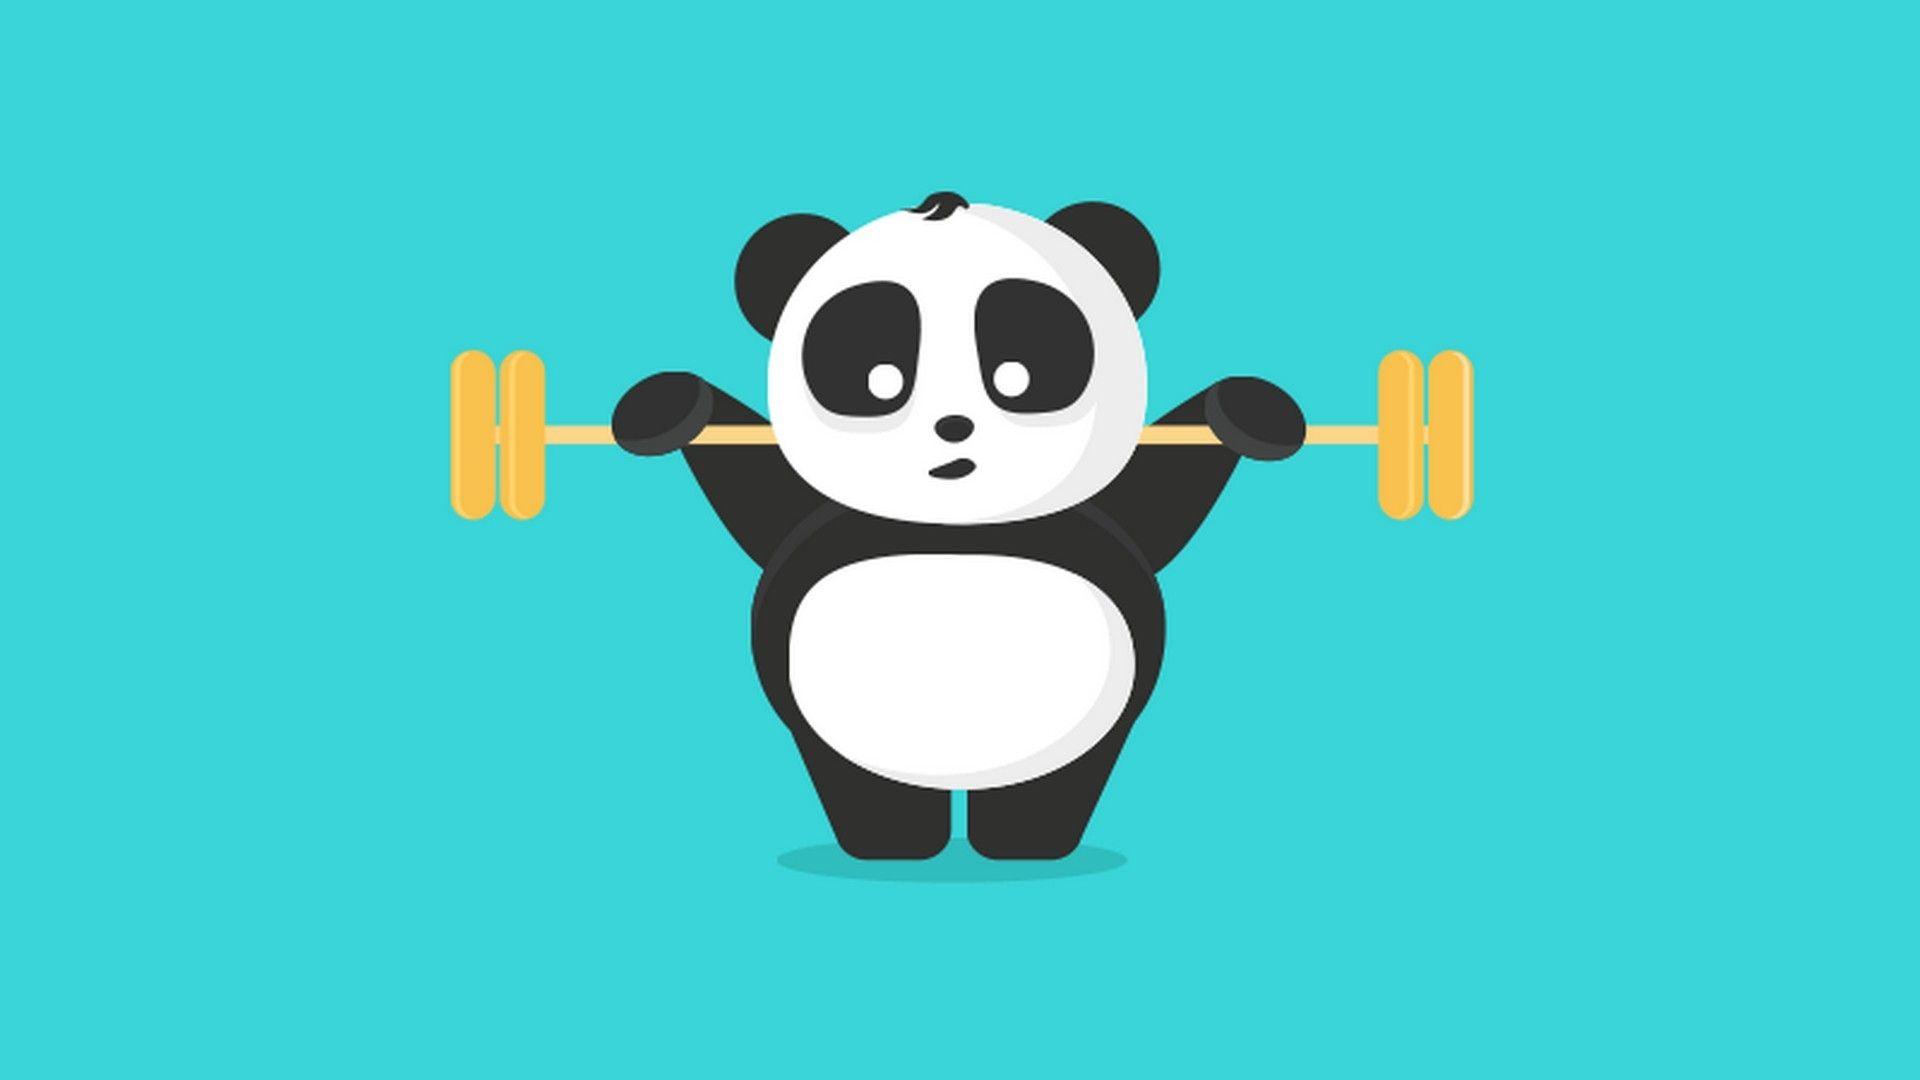 Funny Cute Baby Panda Wallpaper HD - 2018 Wallpapers HD | Panda .